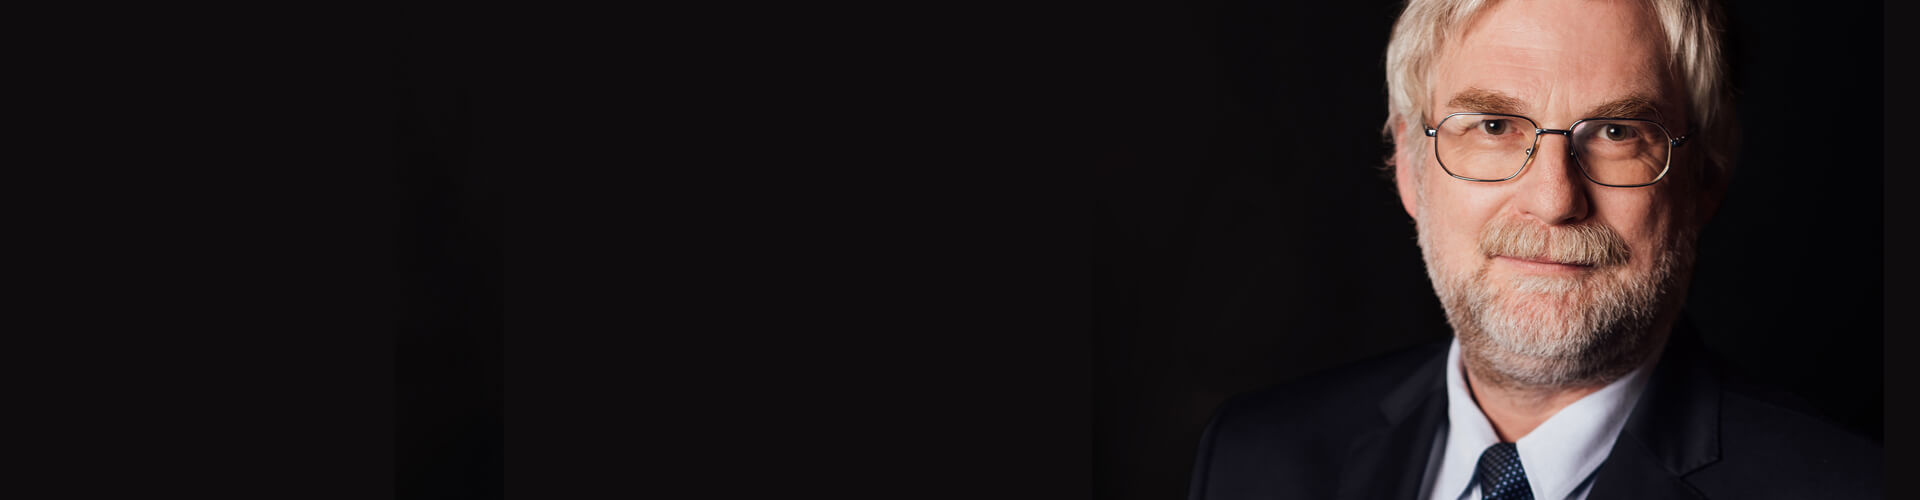 banner wideo z prezesem Robertem Czułą, Soneta, producent oprogramowania ERP enova365